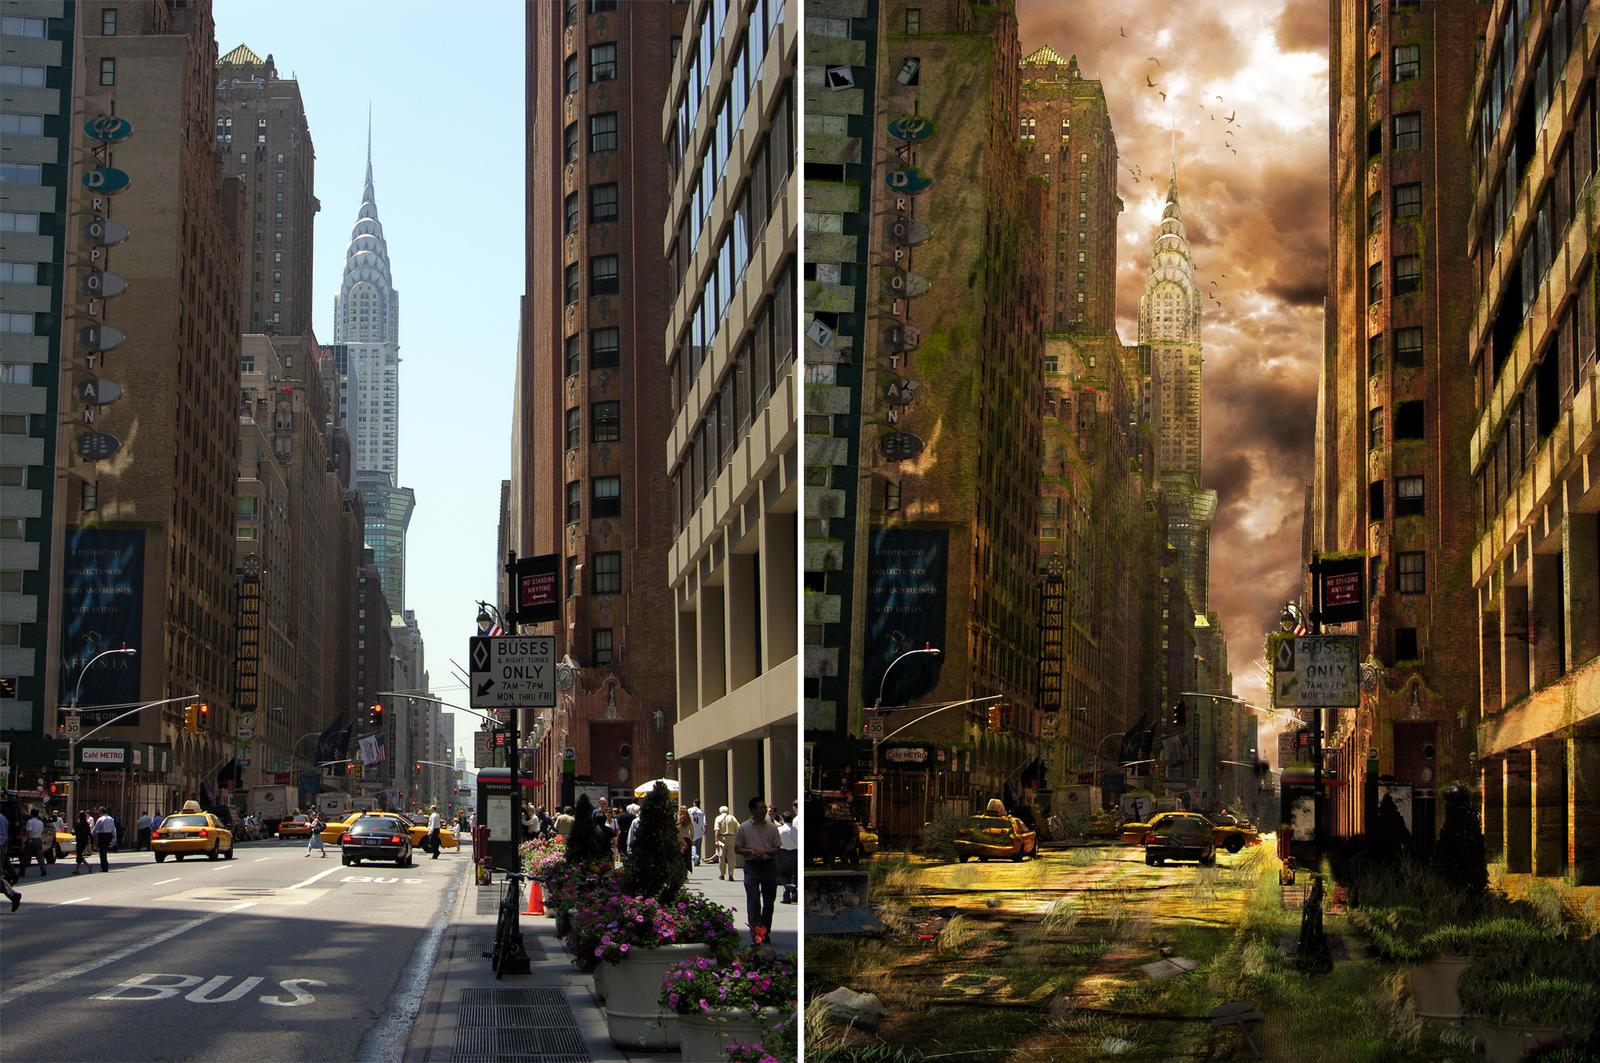 Apocalyptic City training... by pete753ad on DeviantArt Разрушенный Город в Фотошопе